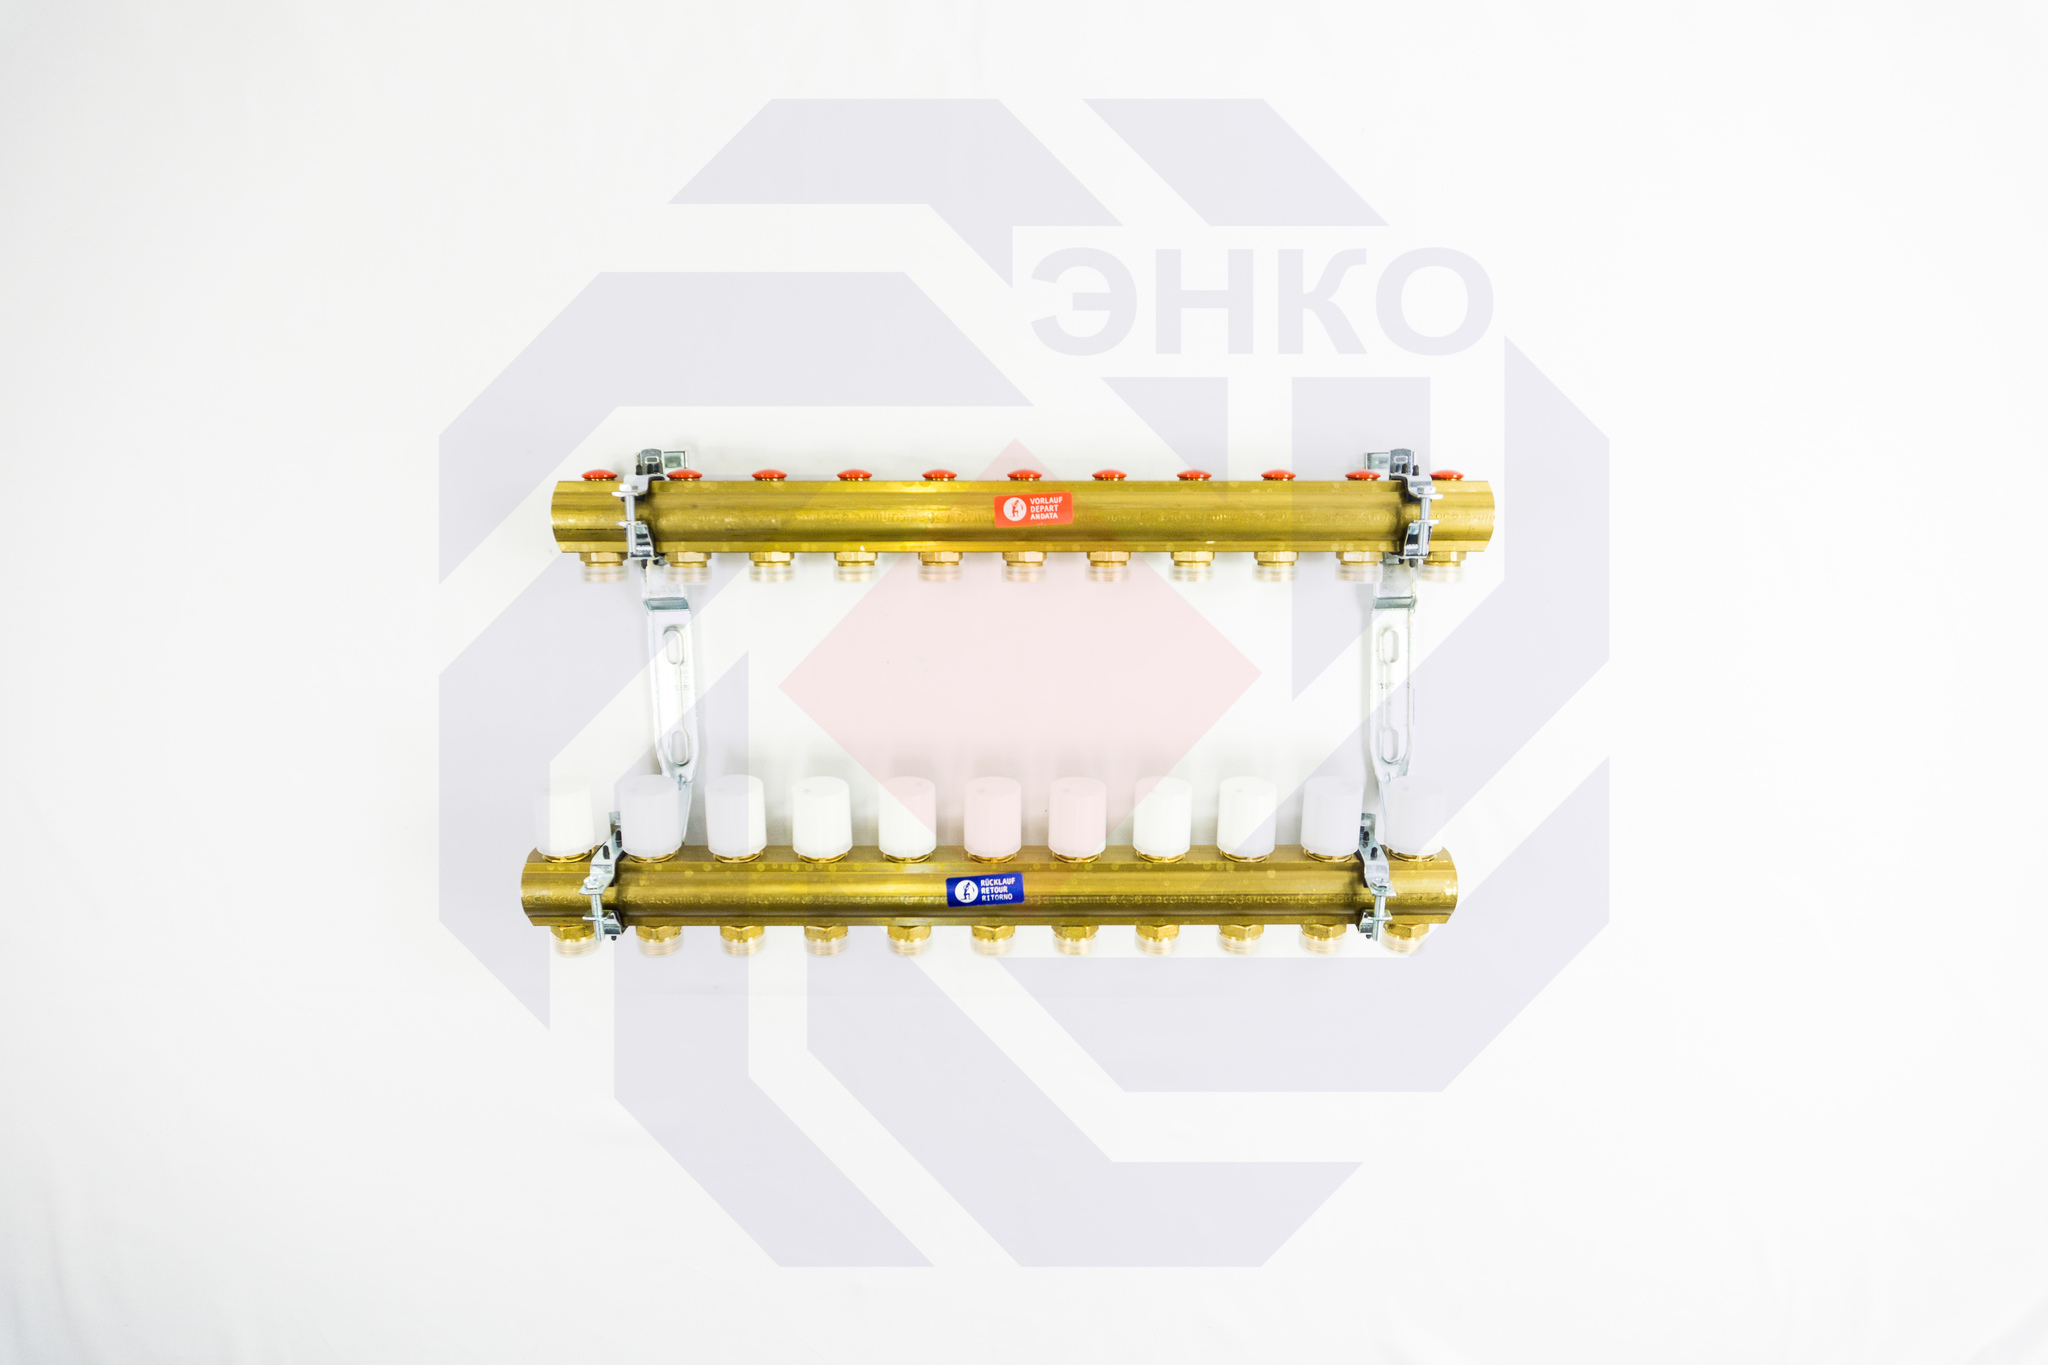 Комплект коллекторов без расходомеров GIACOMINI R553E 11 контуров